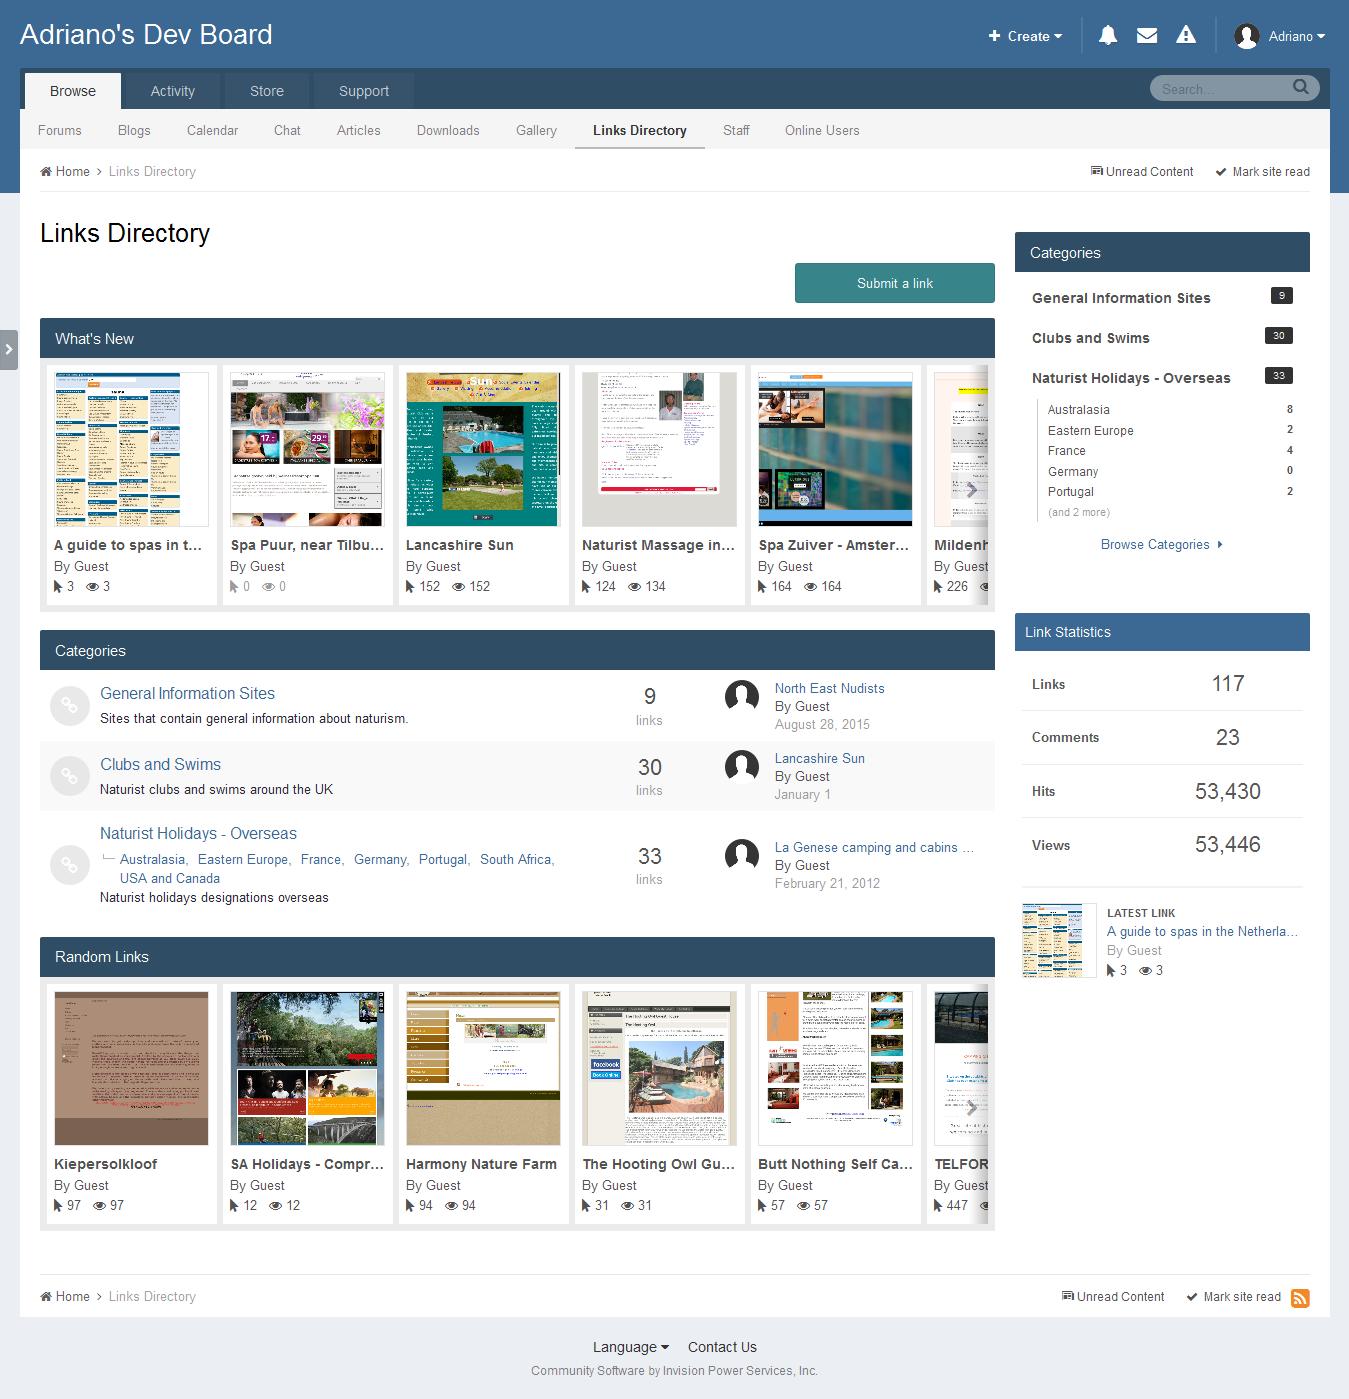 Links Directory